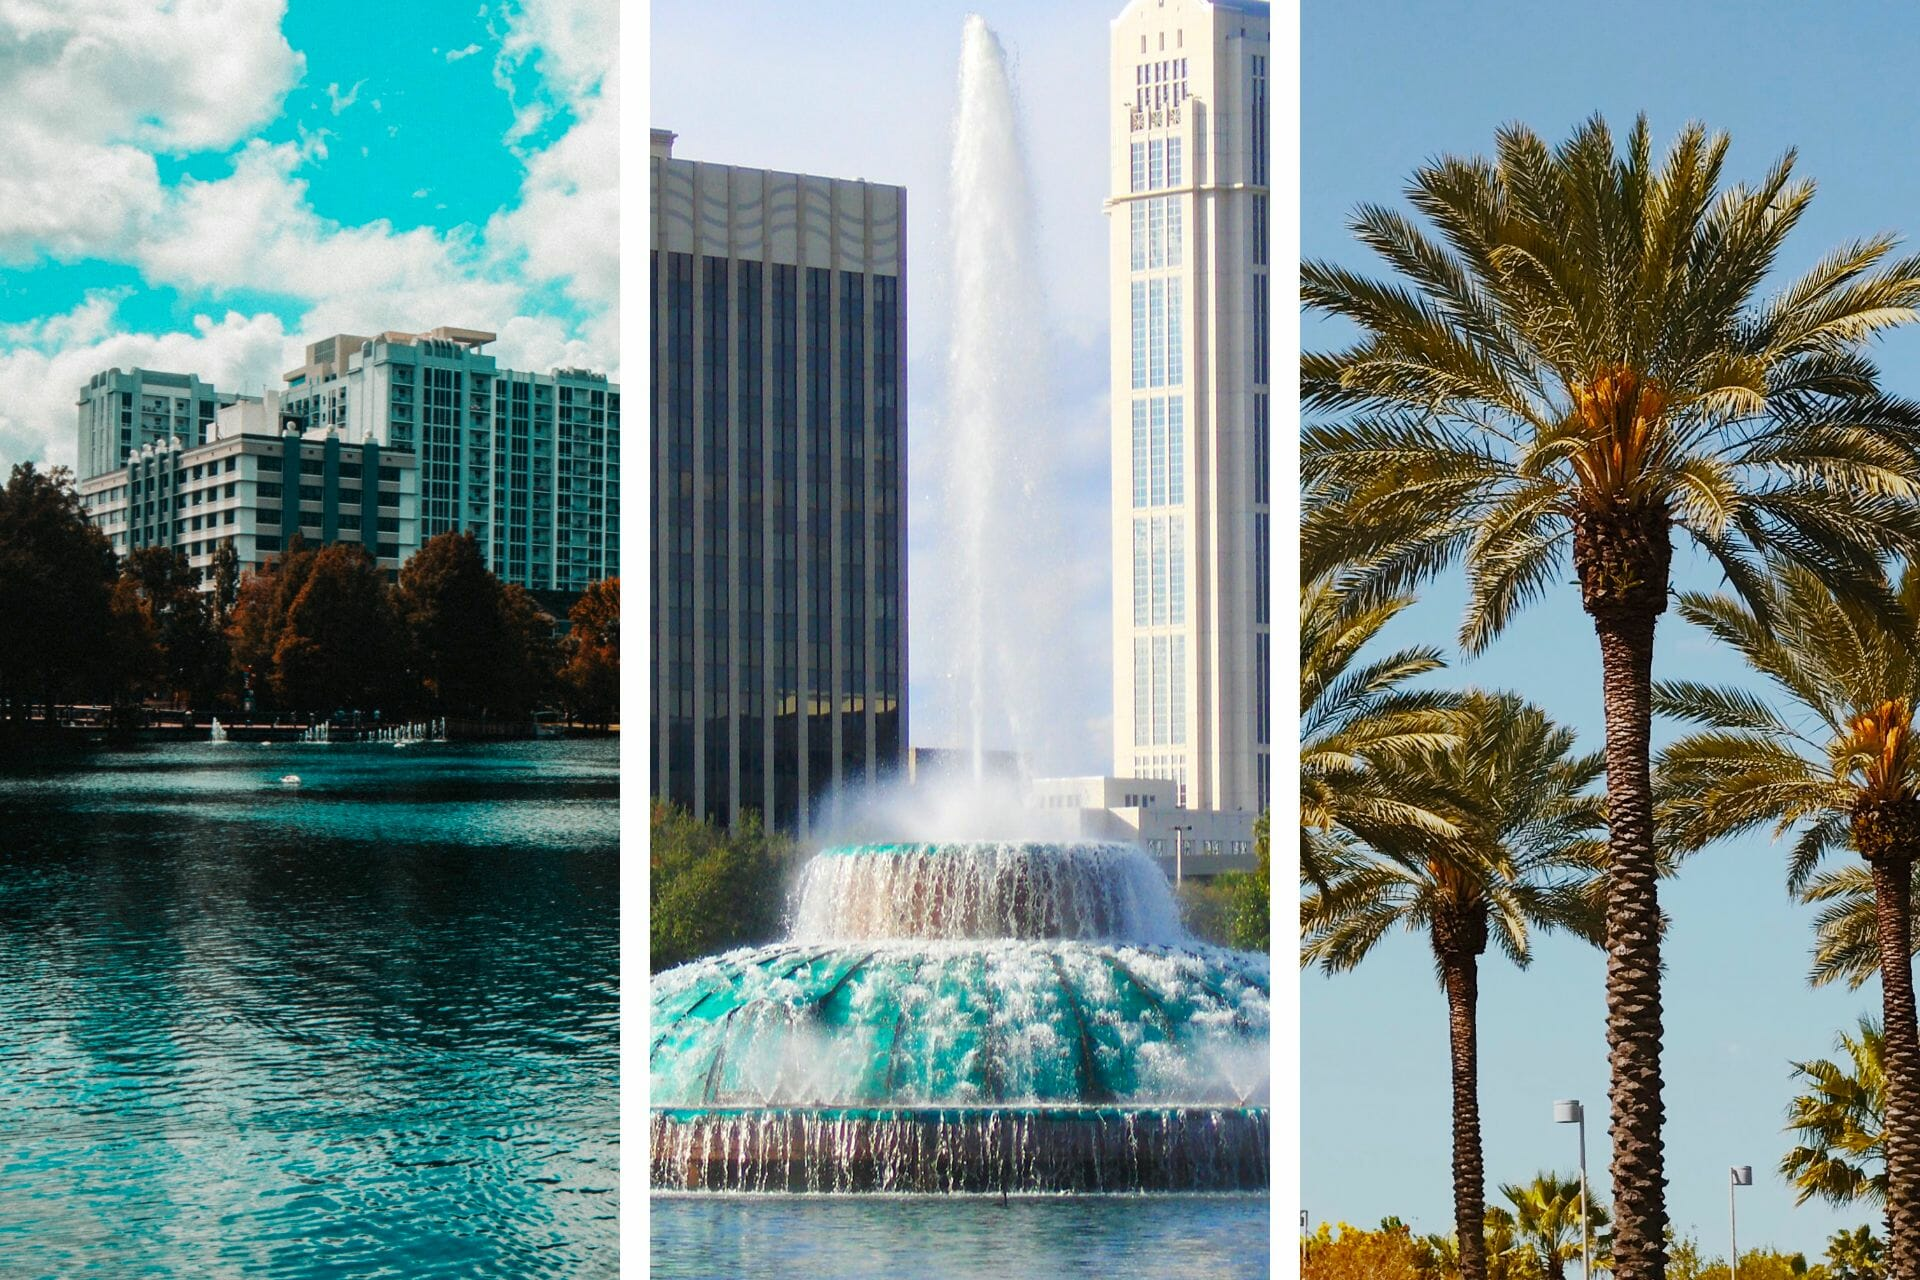 6+ Family-Friendly Things to Do in Orlando Besides Theme Parks (2021) via @allamericanatlas